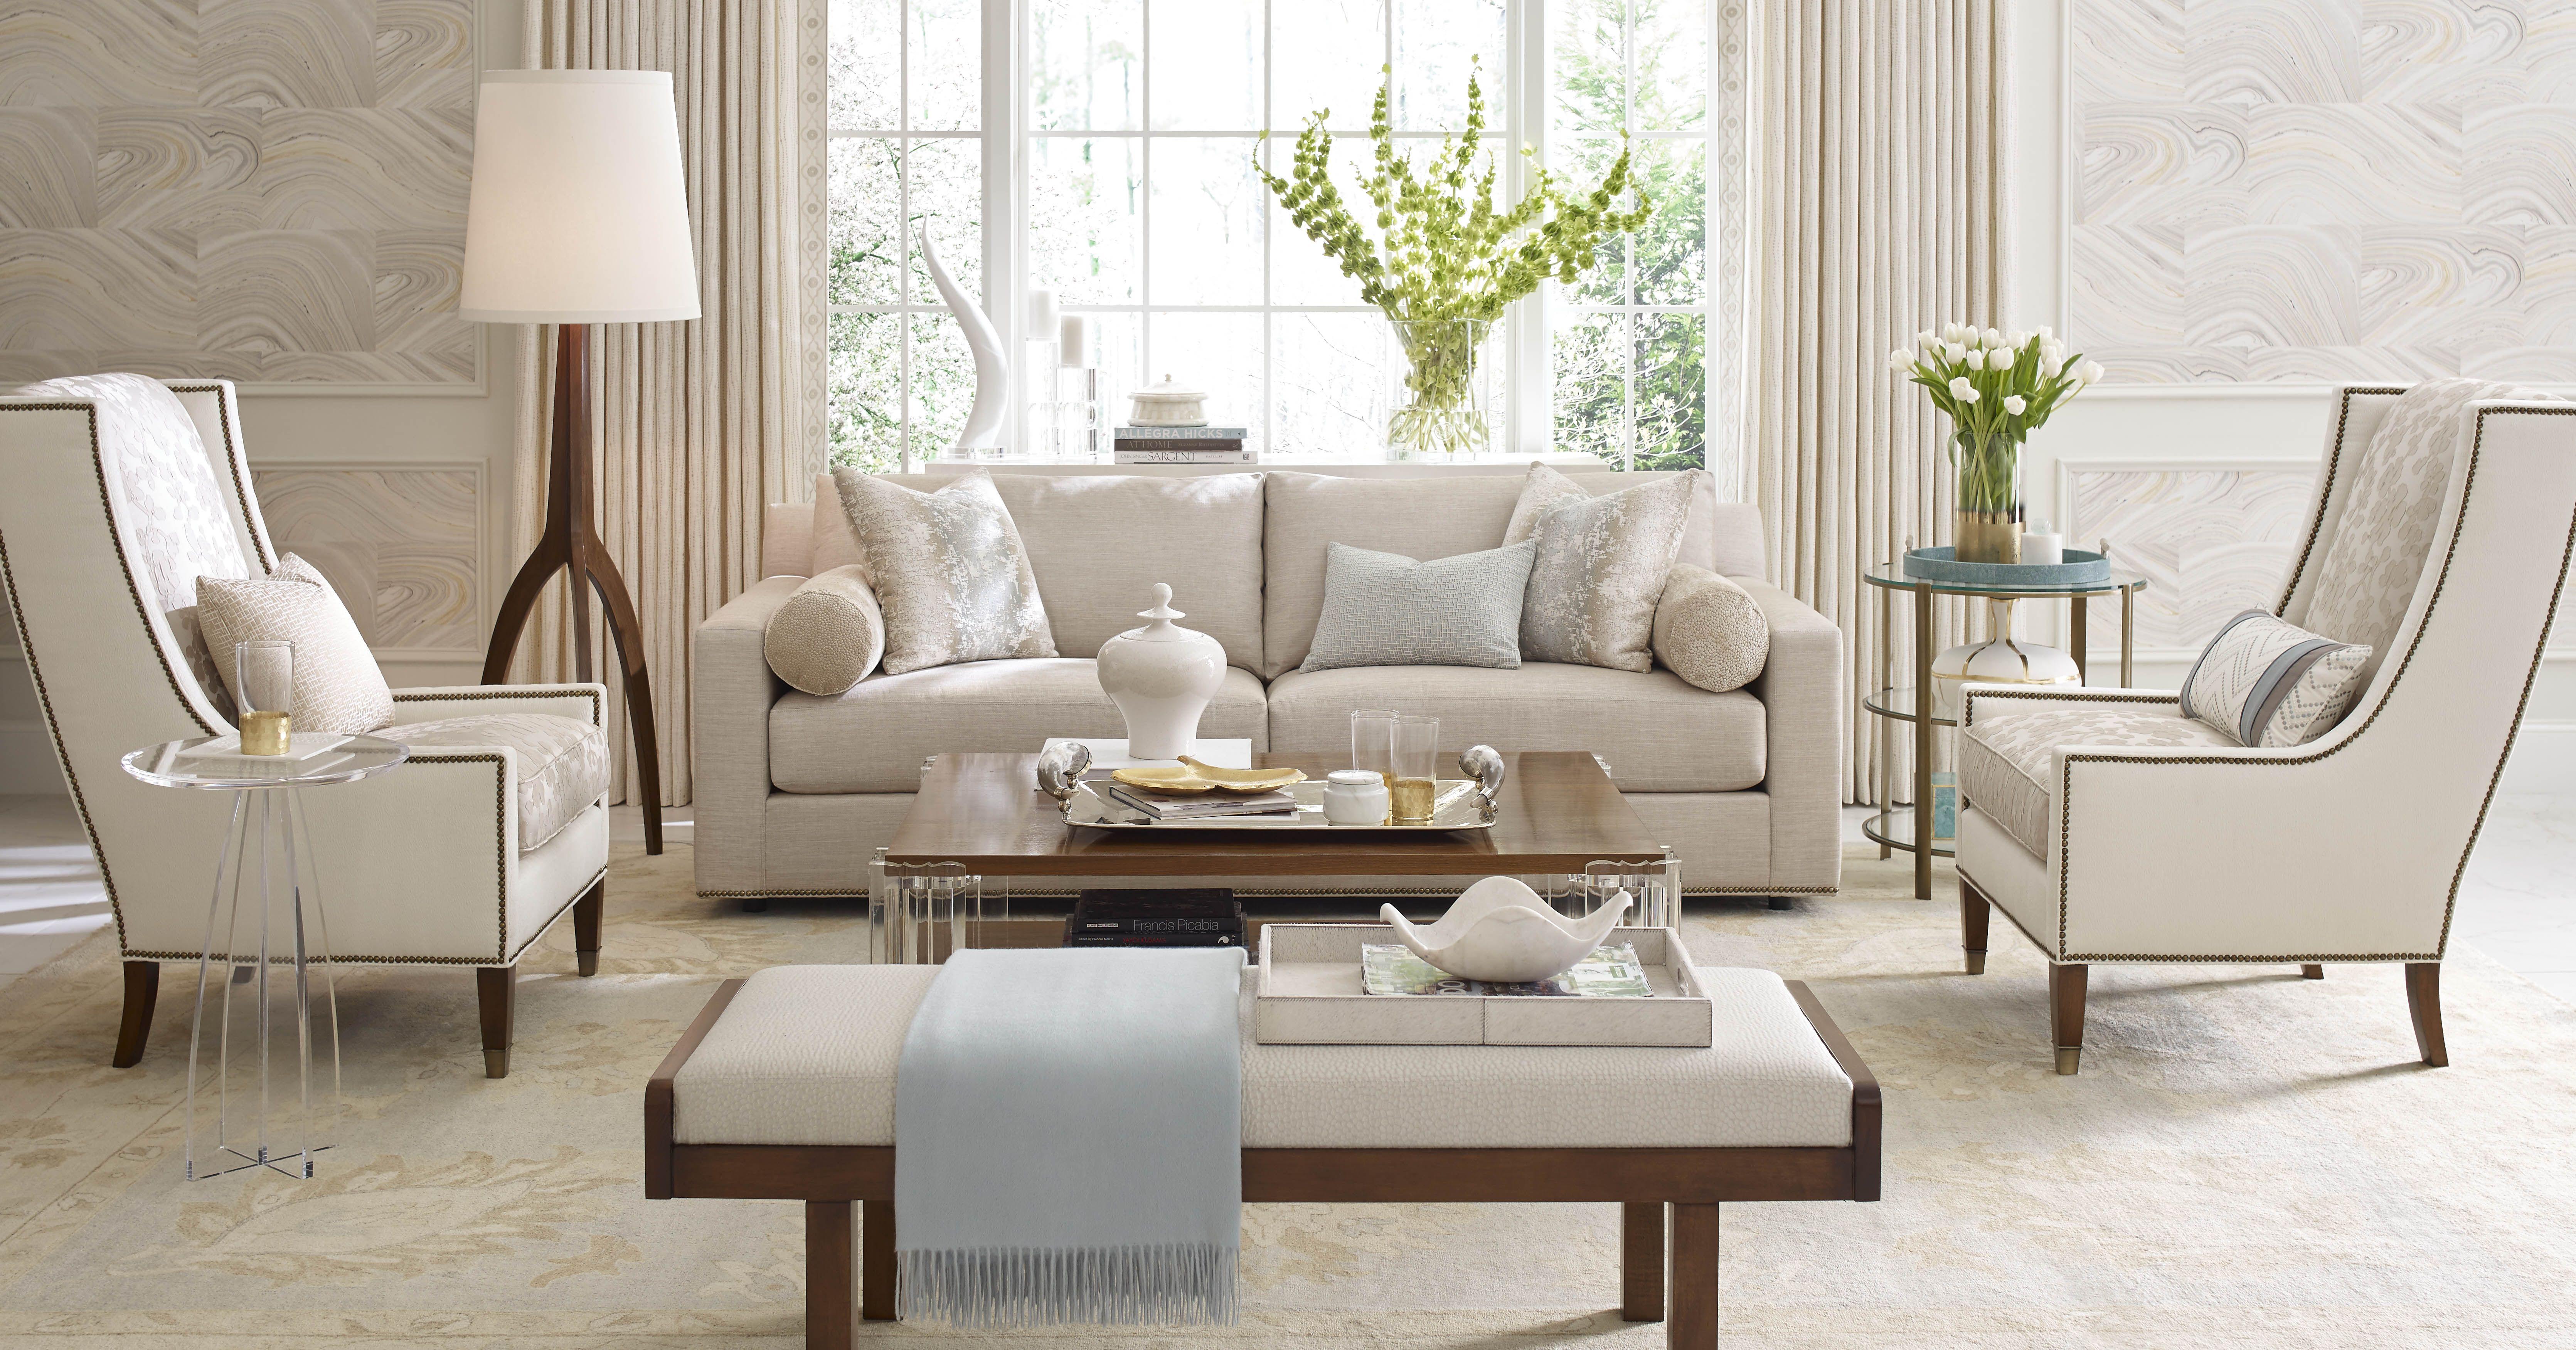 Pin by Debbie Lawrence on Beautiful Kravet Furniture